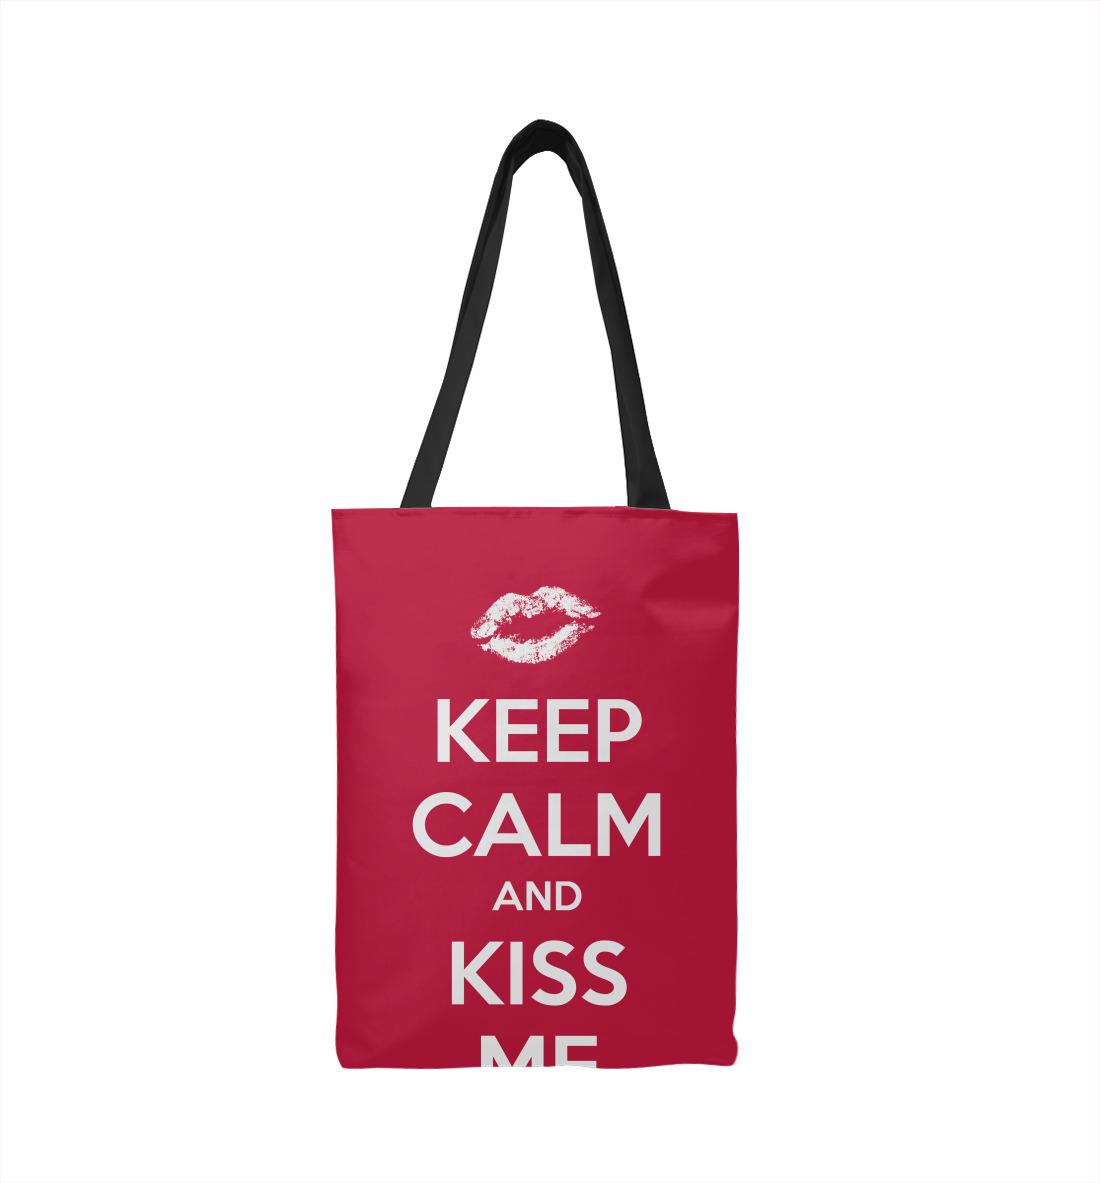 Фото - Keep calm and kiss me keep calm and kiss me